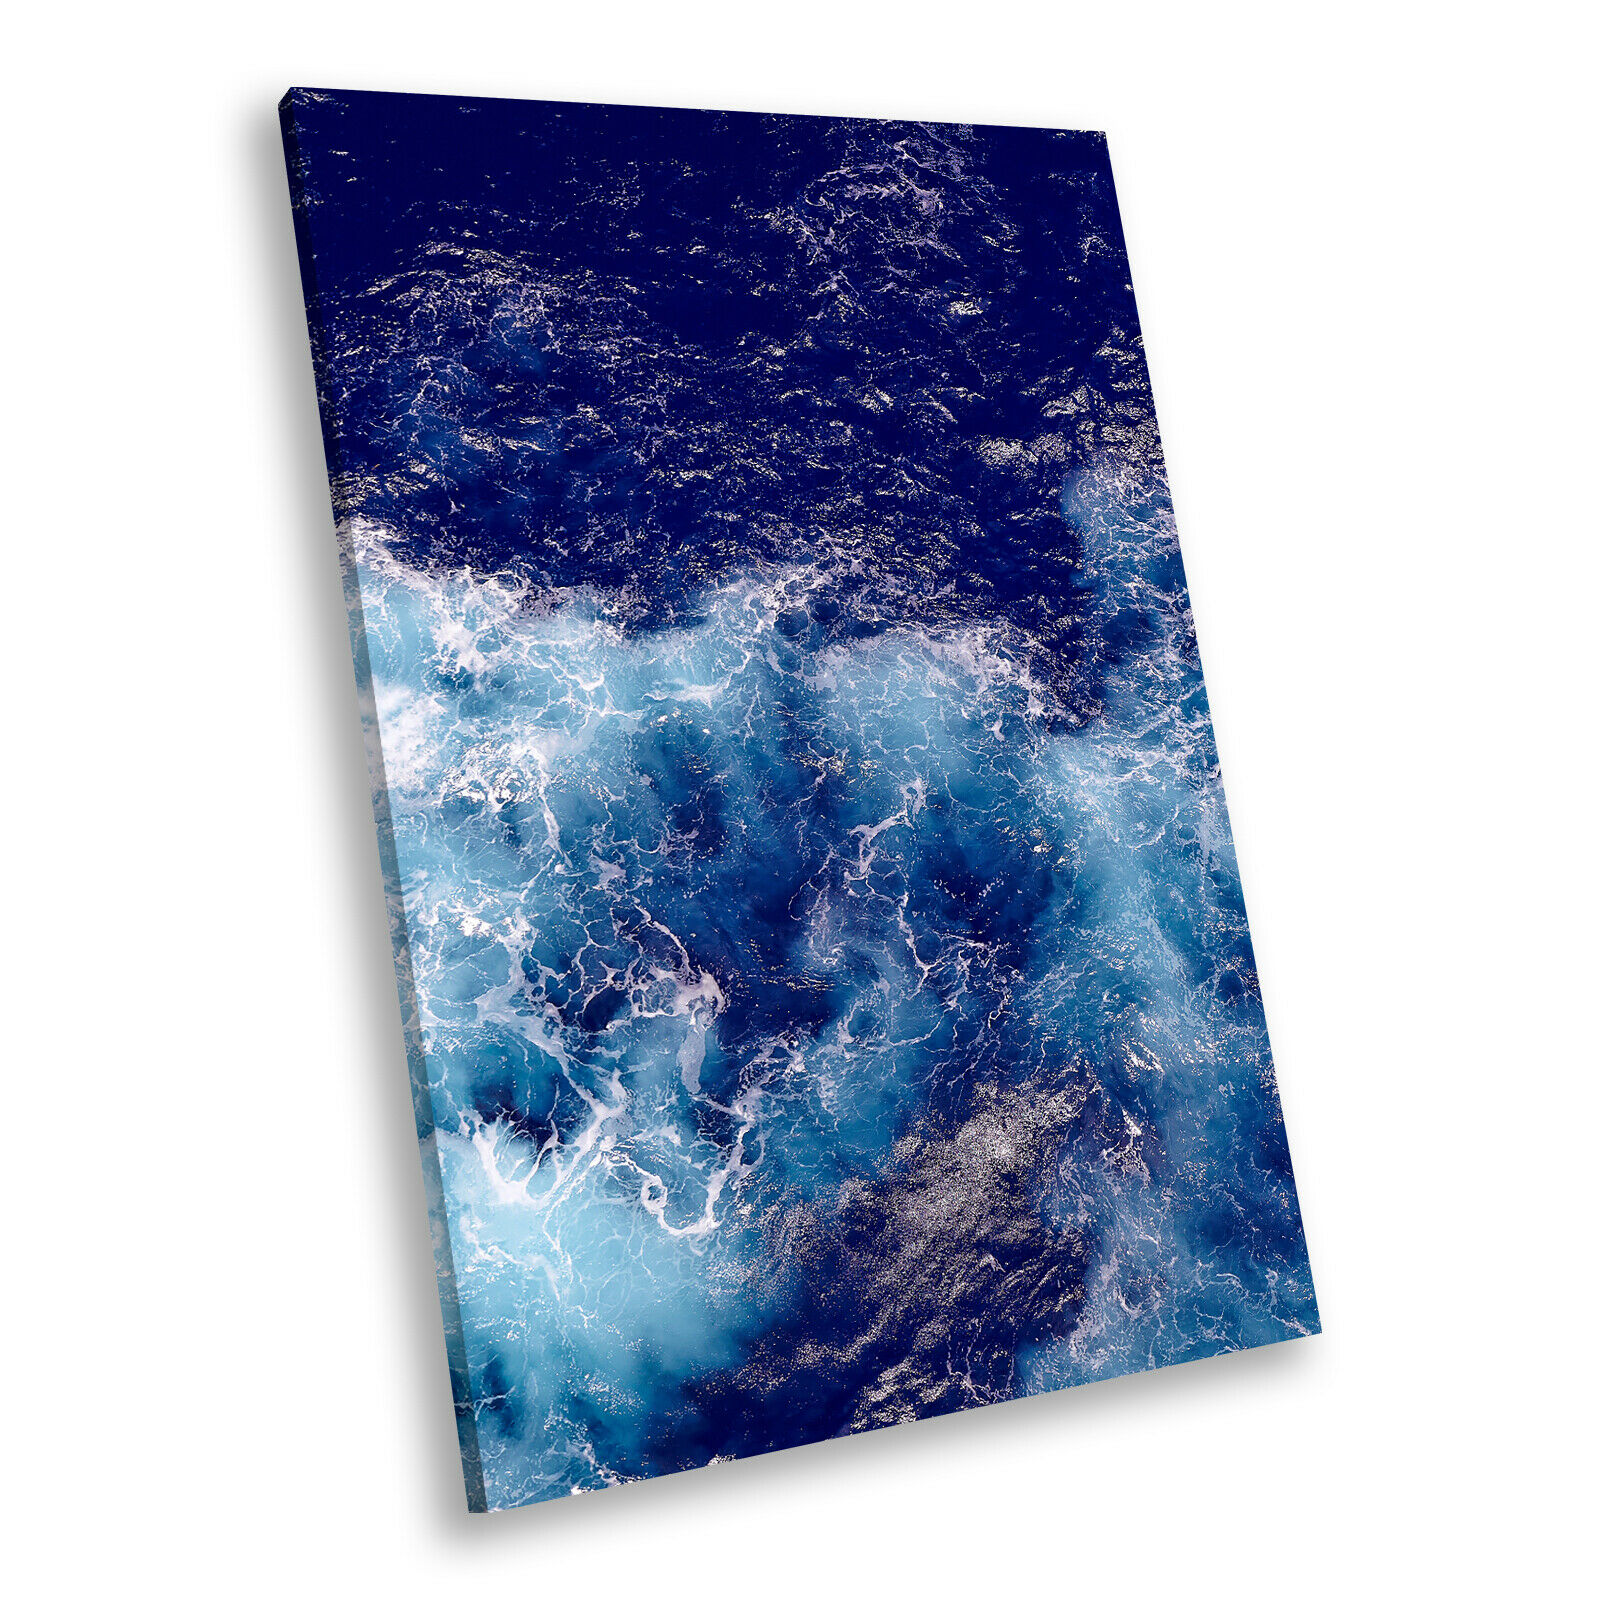 Blau Weiß Wave Ocean Nature Portrait Scenic Canvas Wall Art Large Picture Print